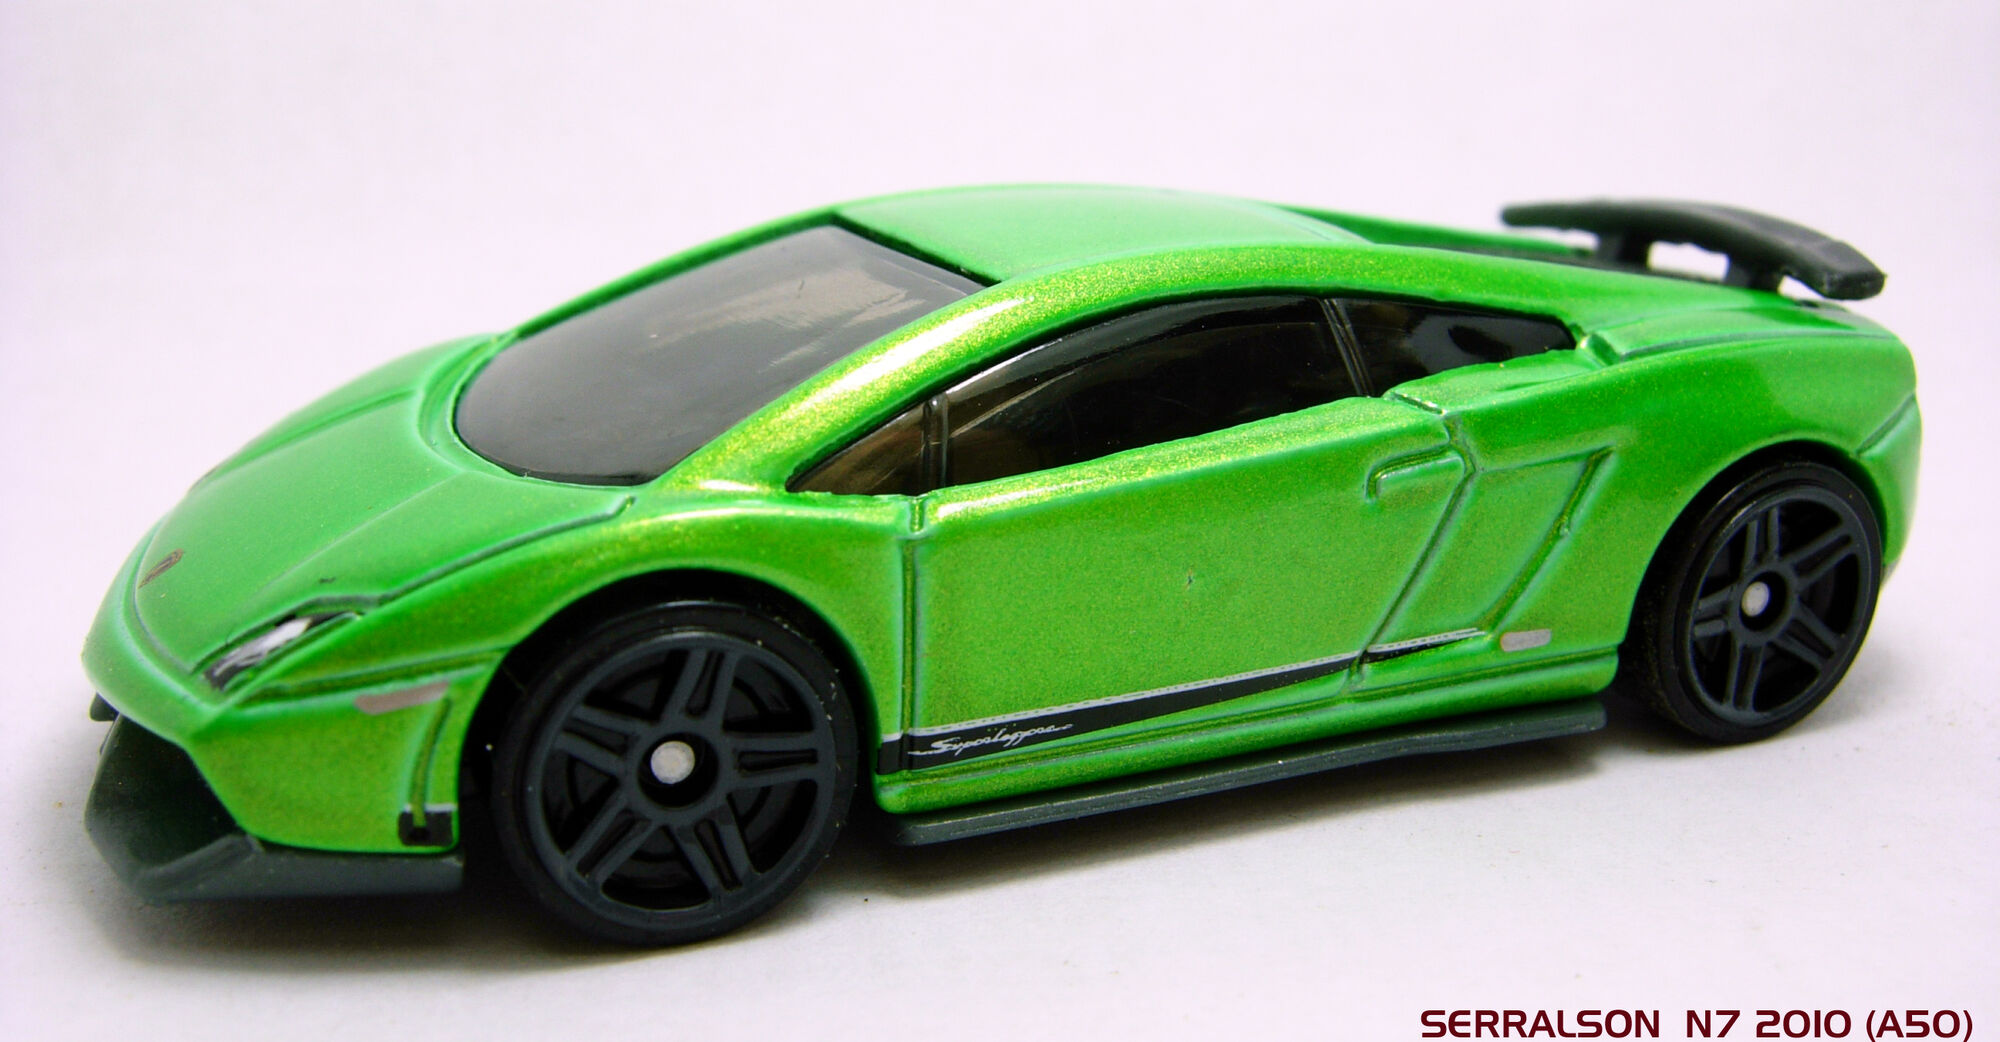 2000?cb=20101220215324 Surprising Lamborghini Gallardo Hot Wheels Wiki Cars Trend